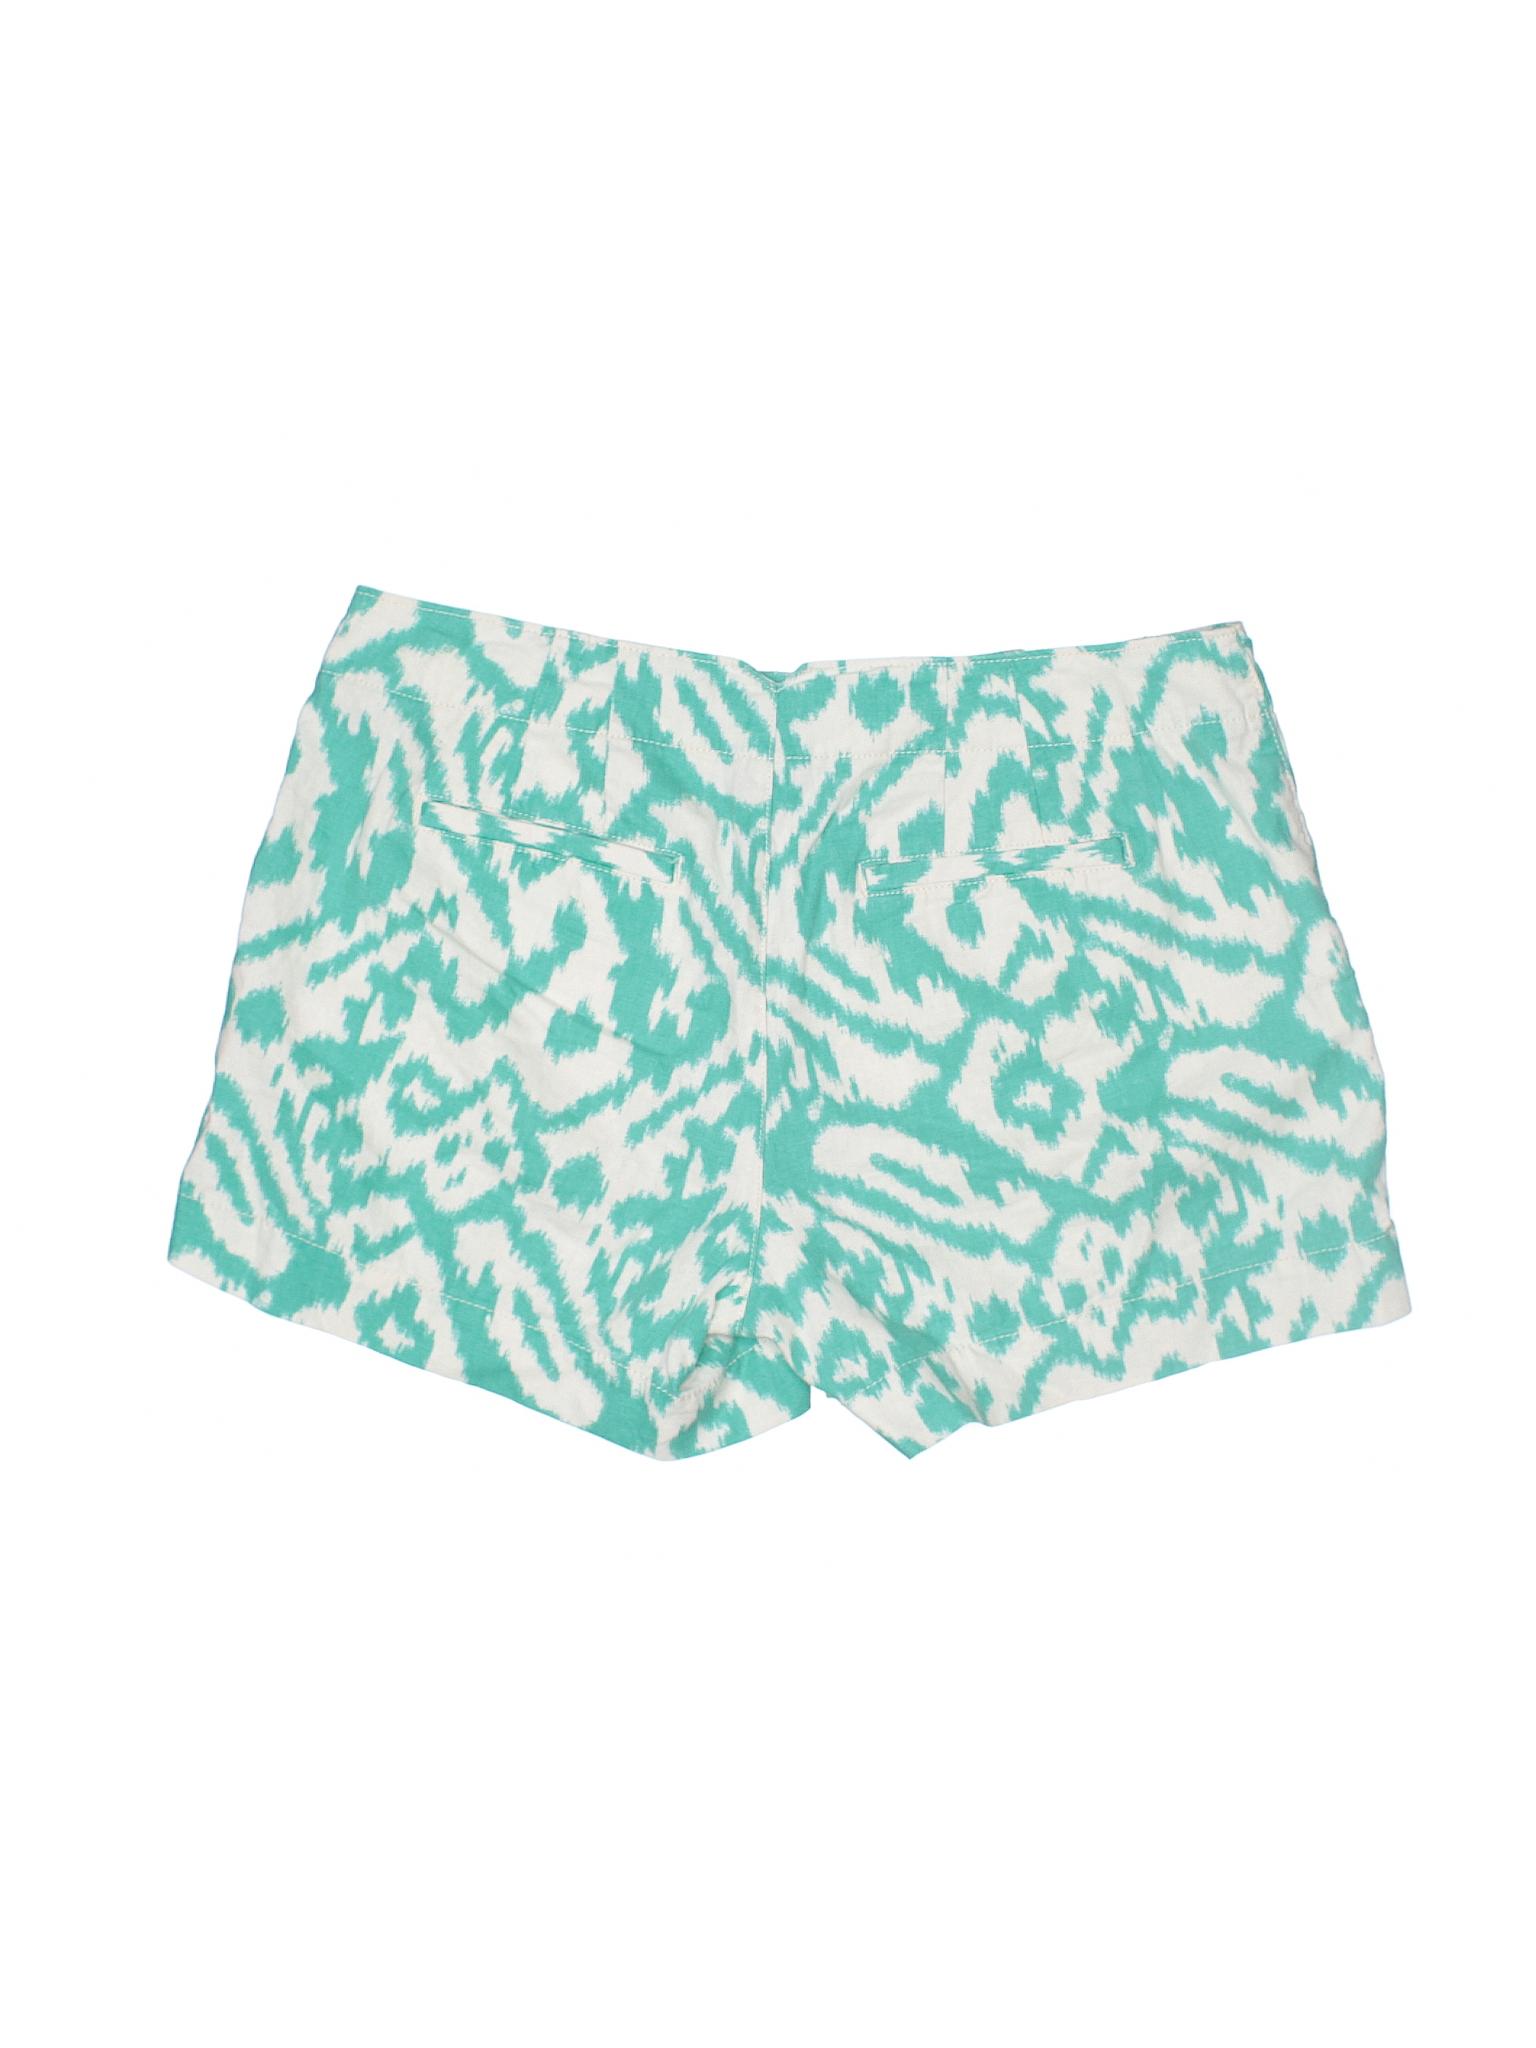 Boutique Shorts Khaki LOFT Ann Taylor FwpqgrFa